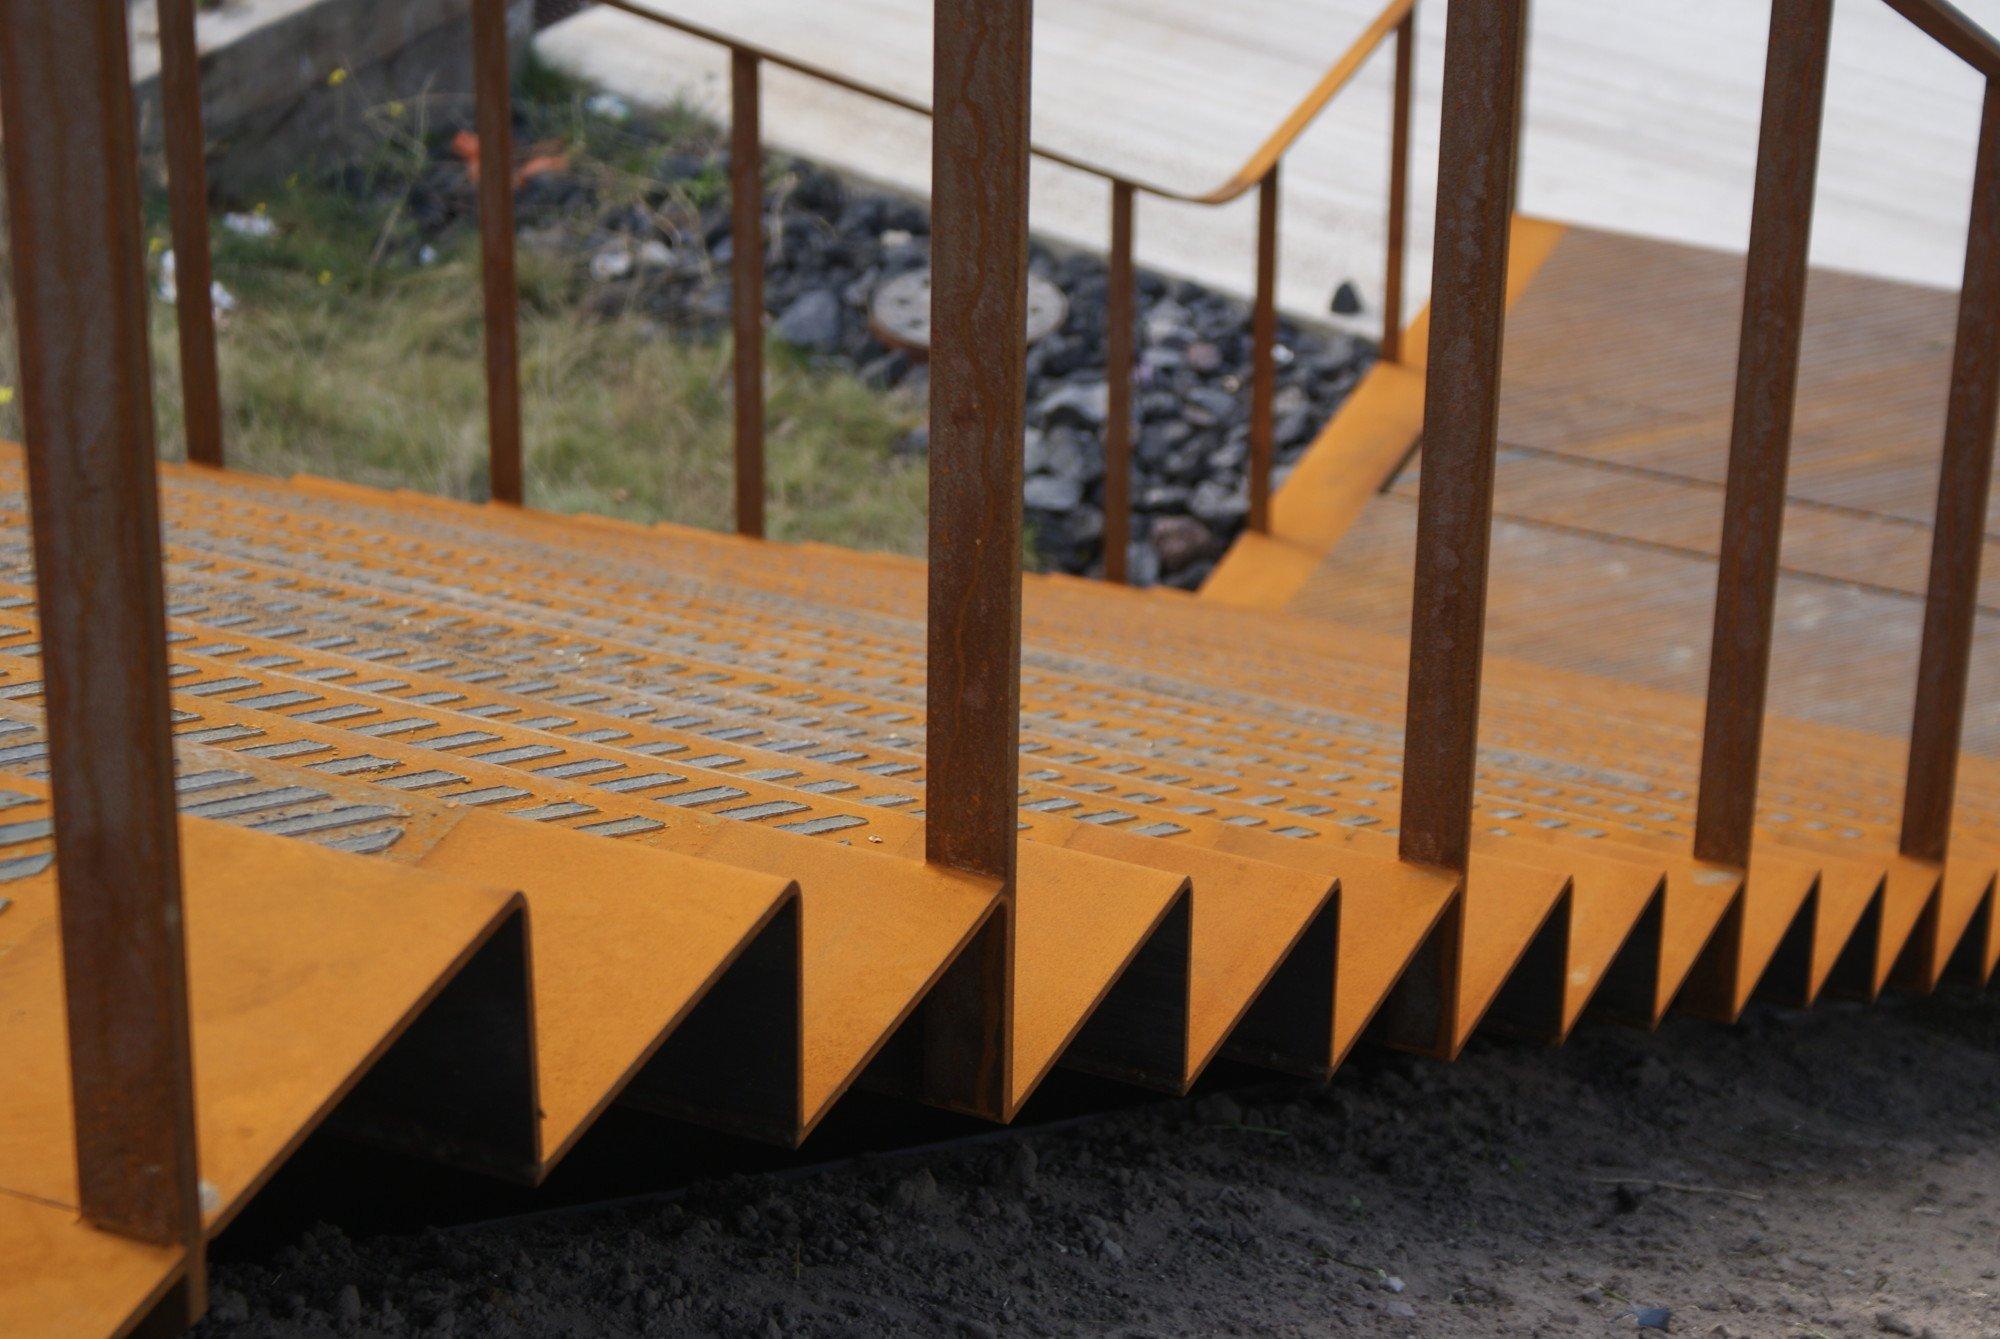 metalle im treppenbau treppen materialien baustoffe baunetz wissen. Black Bedroom Furniture Sets. Home Design Ideas